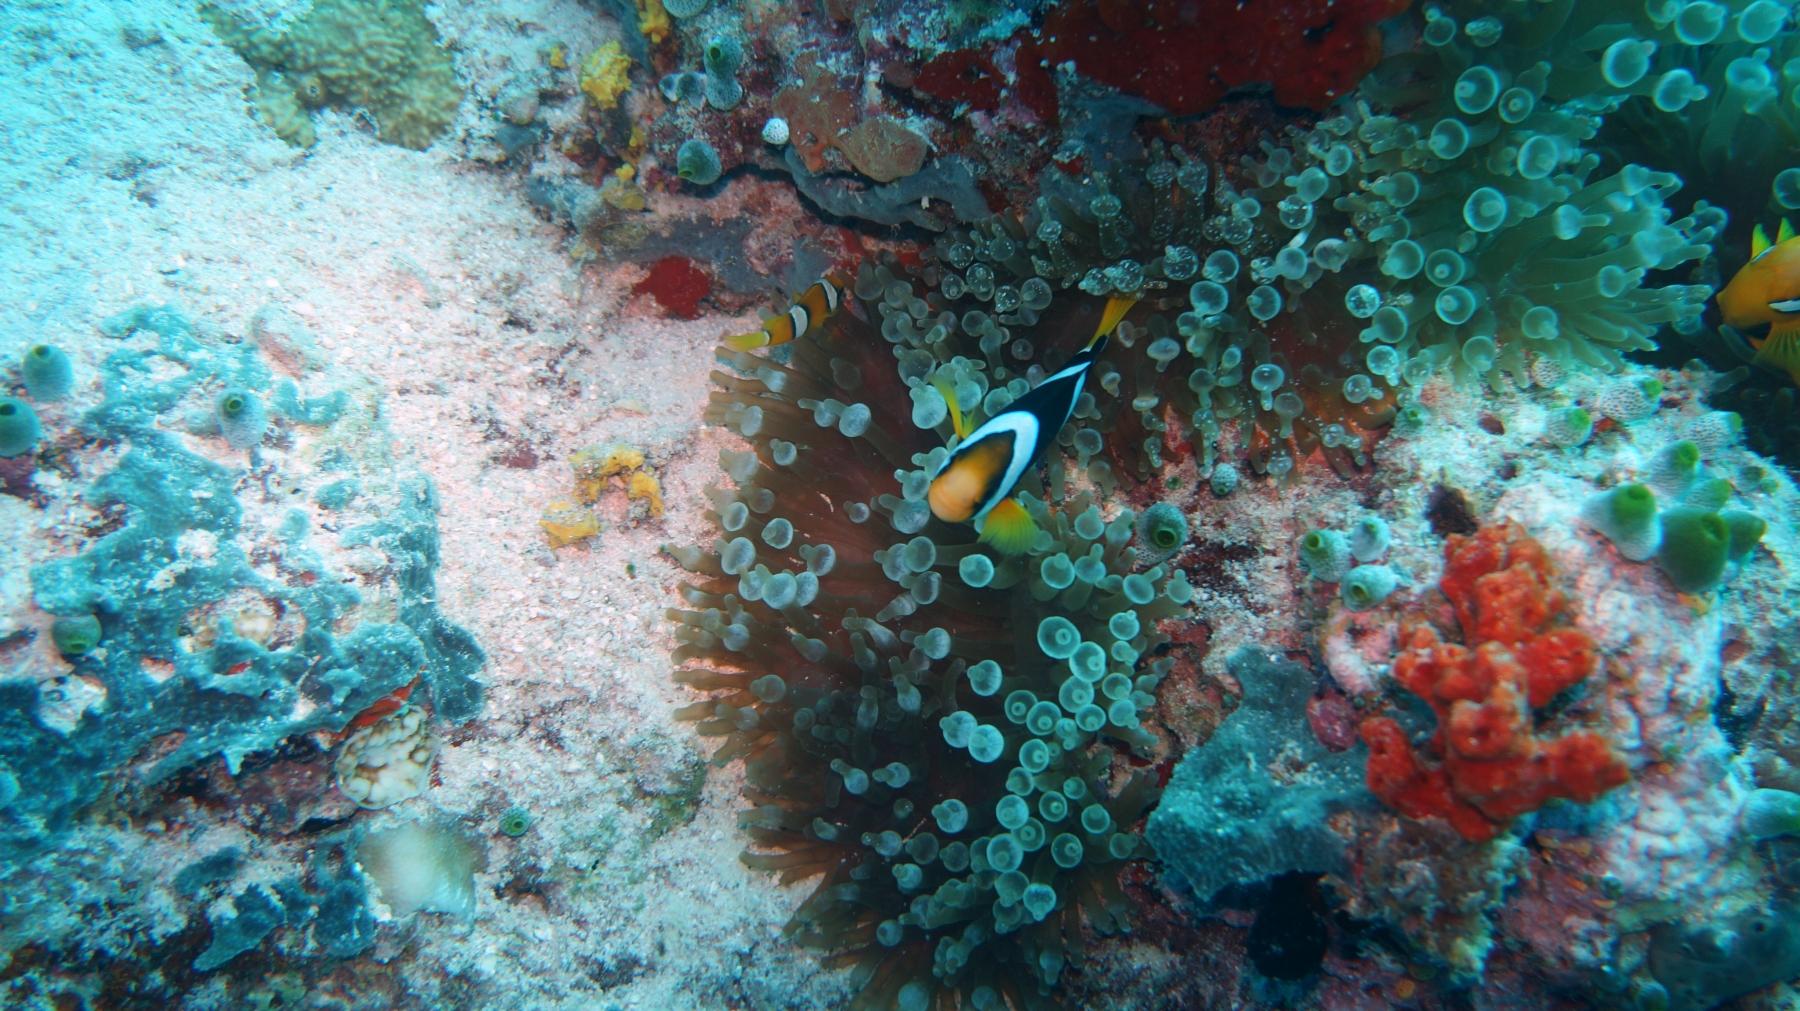 Amphiprion_clarkii_005_C_Damiselas-Peces-Payaso_L_Maldivas_U_Sebas_01072015